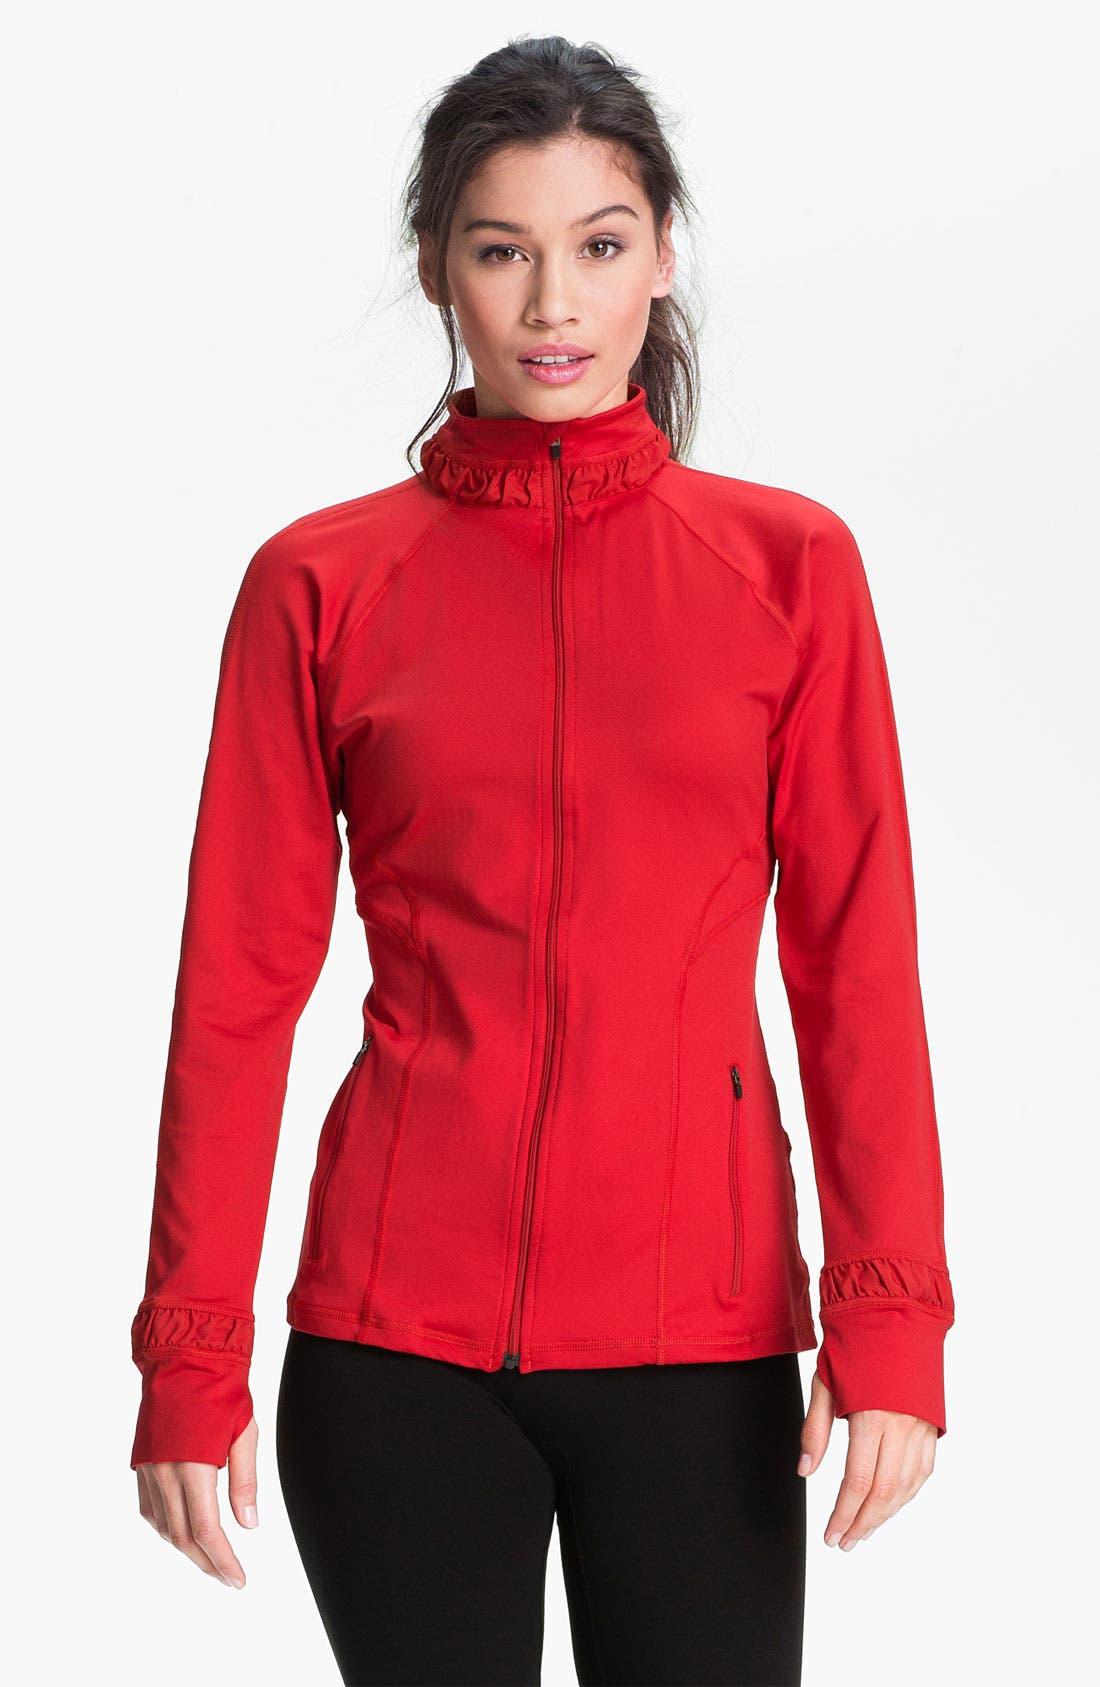 Main Image - SPANX® 'Contour' Activewear Jacket